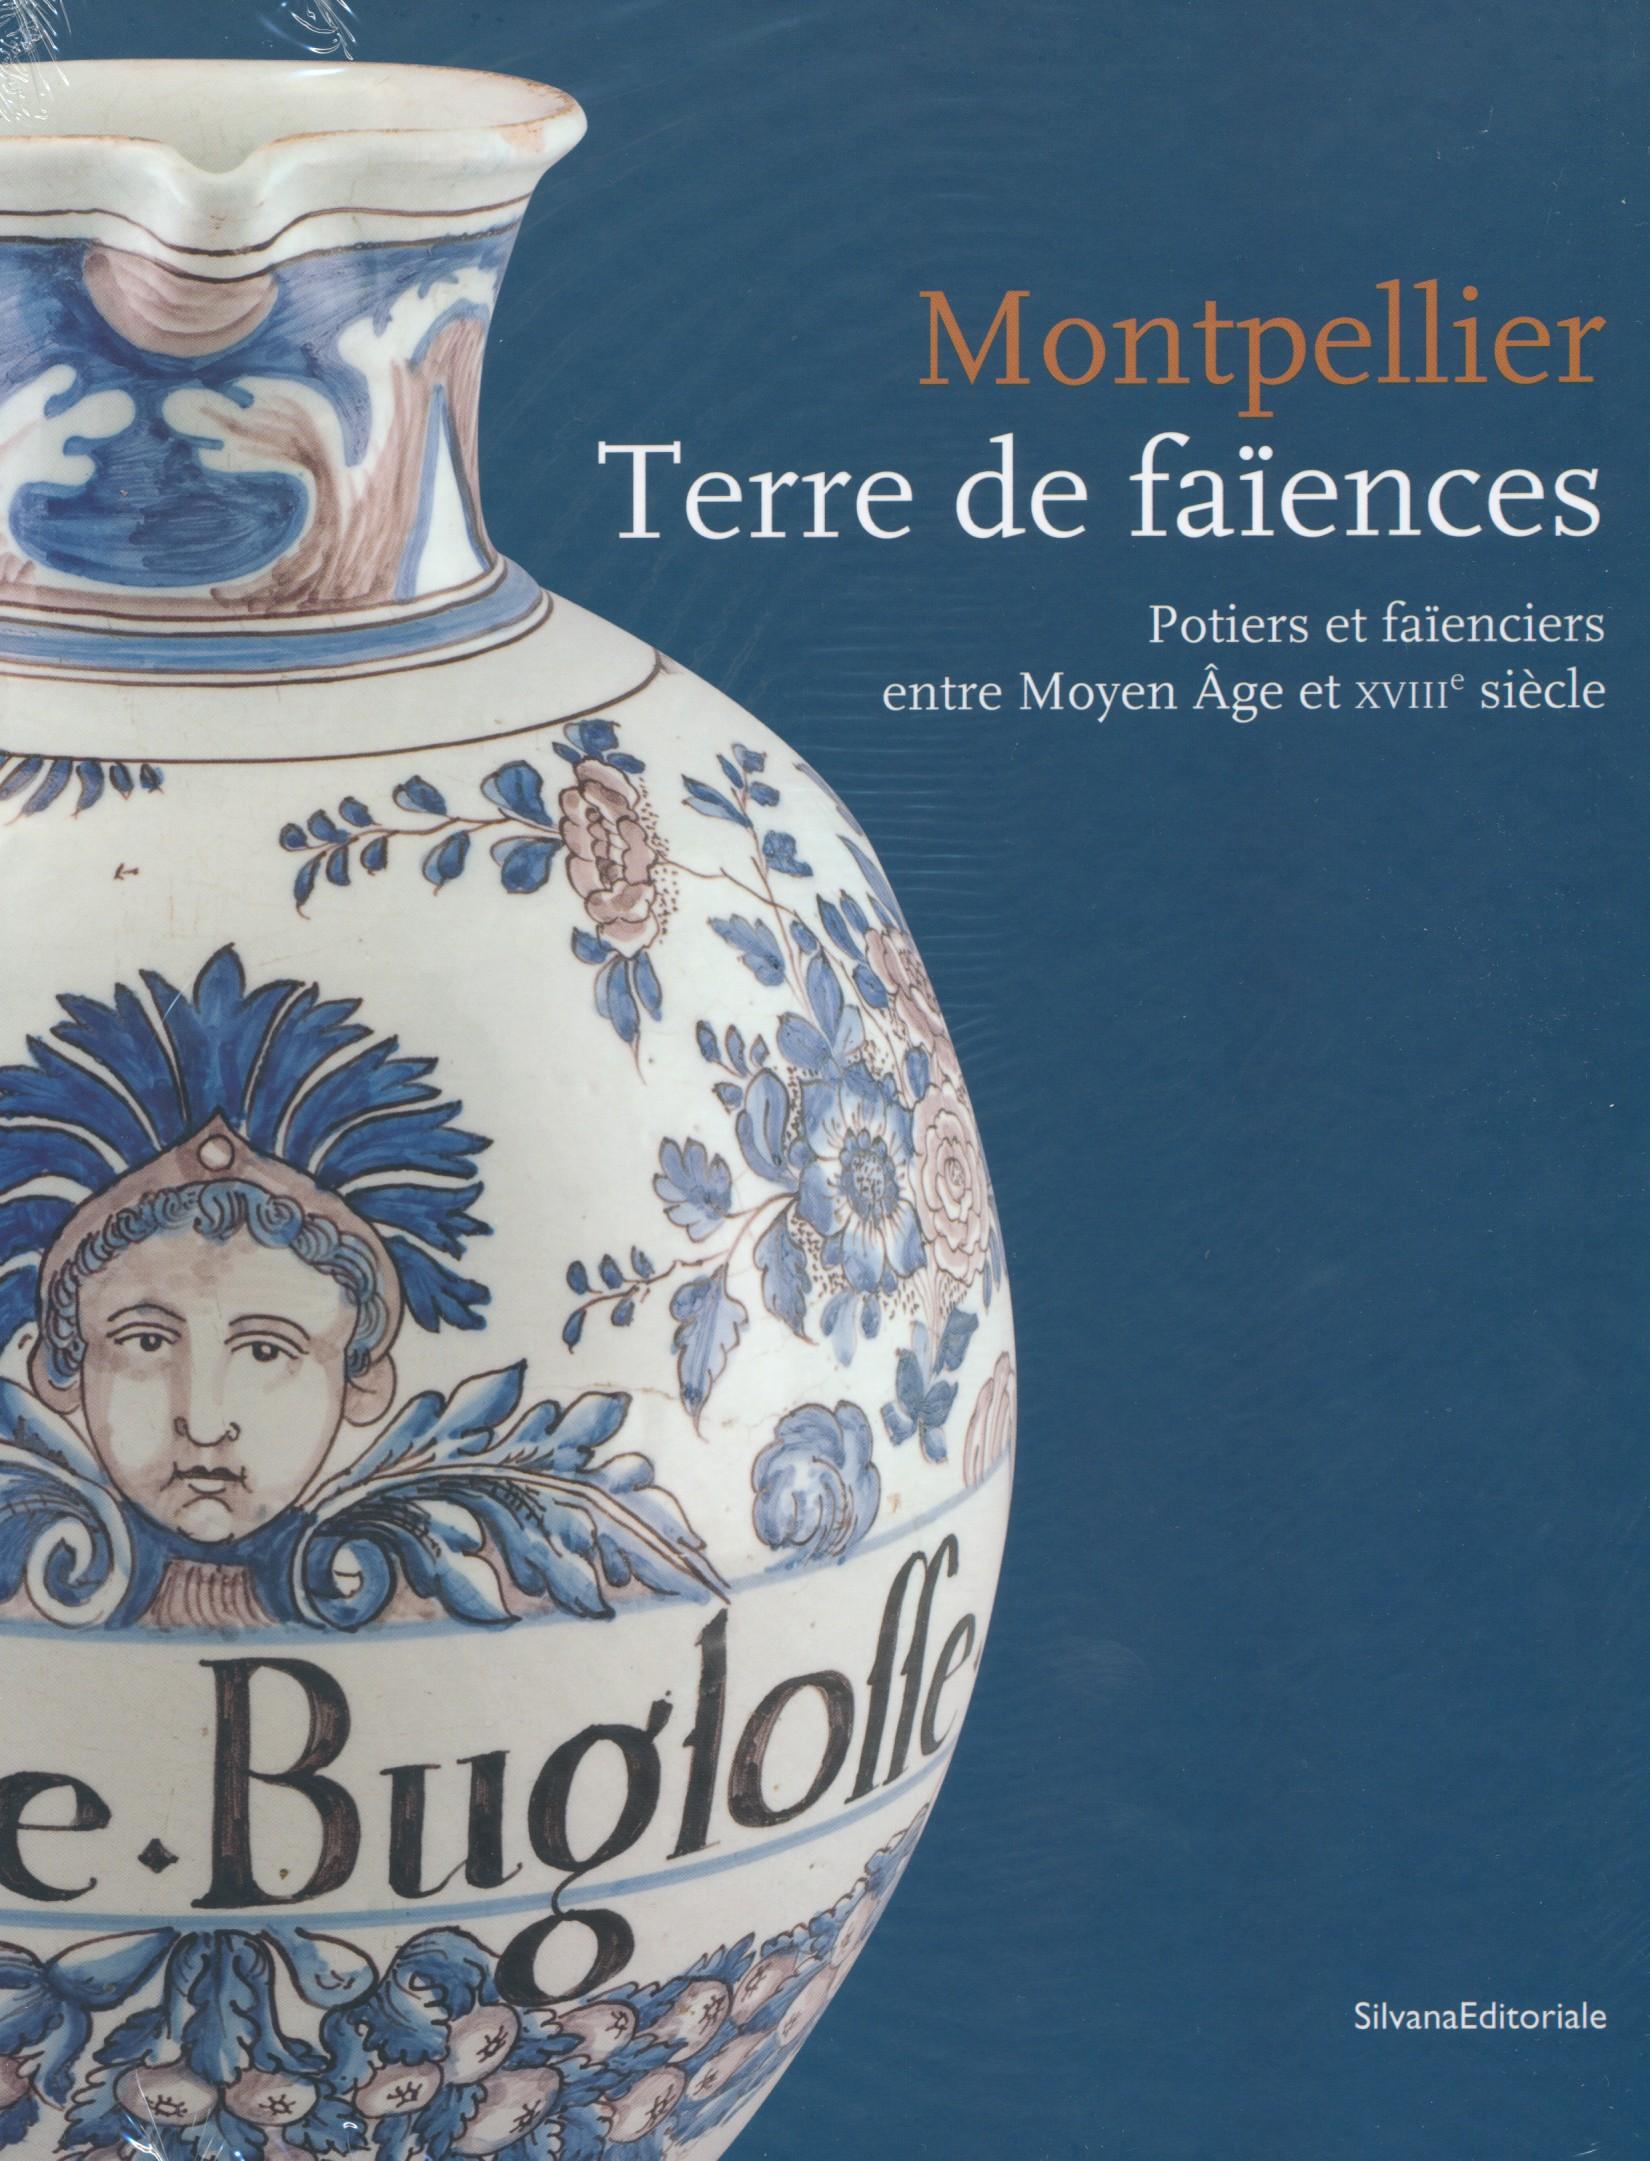 Montpellier terres de faiences moyen age collectif valla for Terre montpellier archi